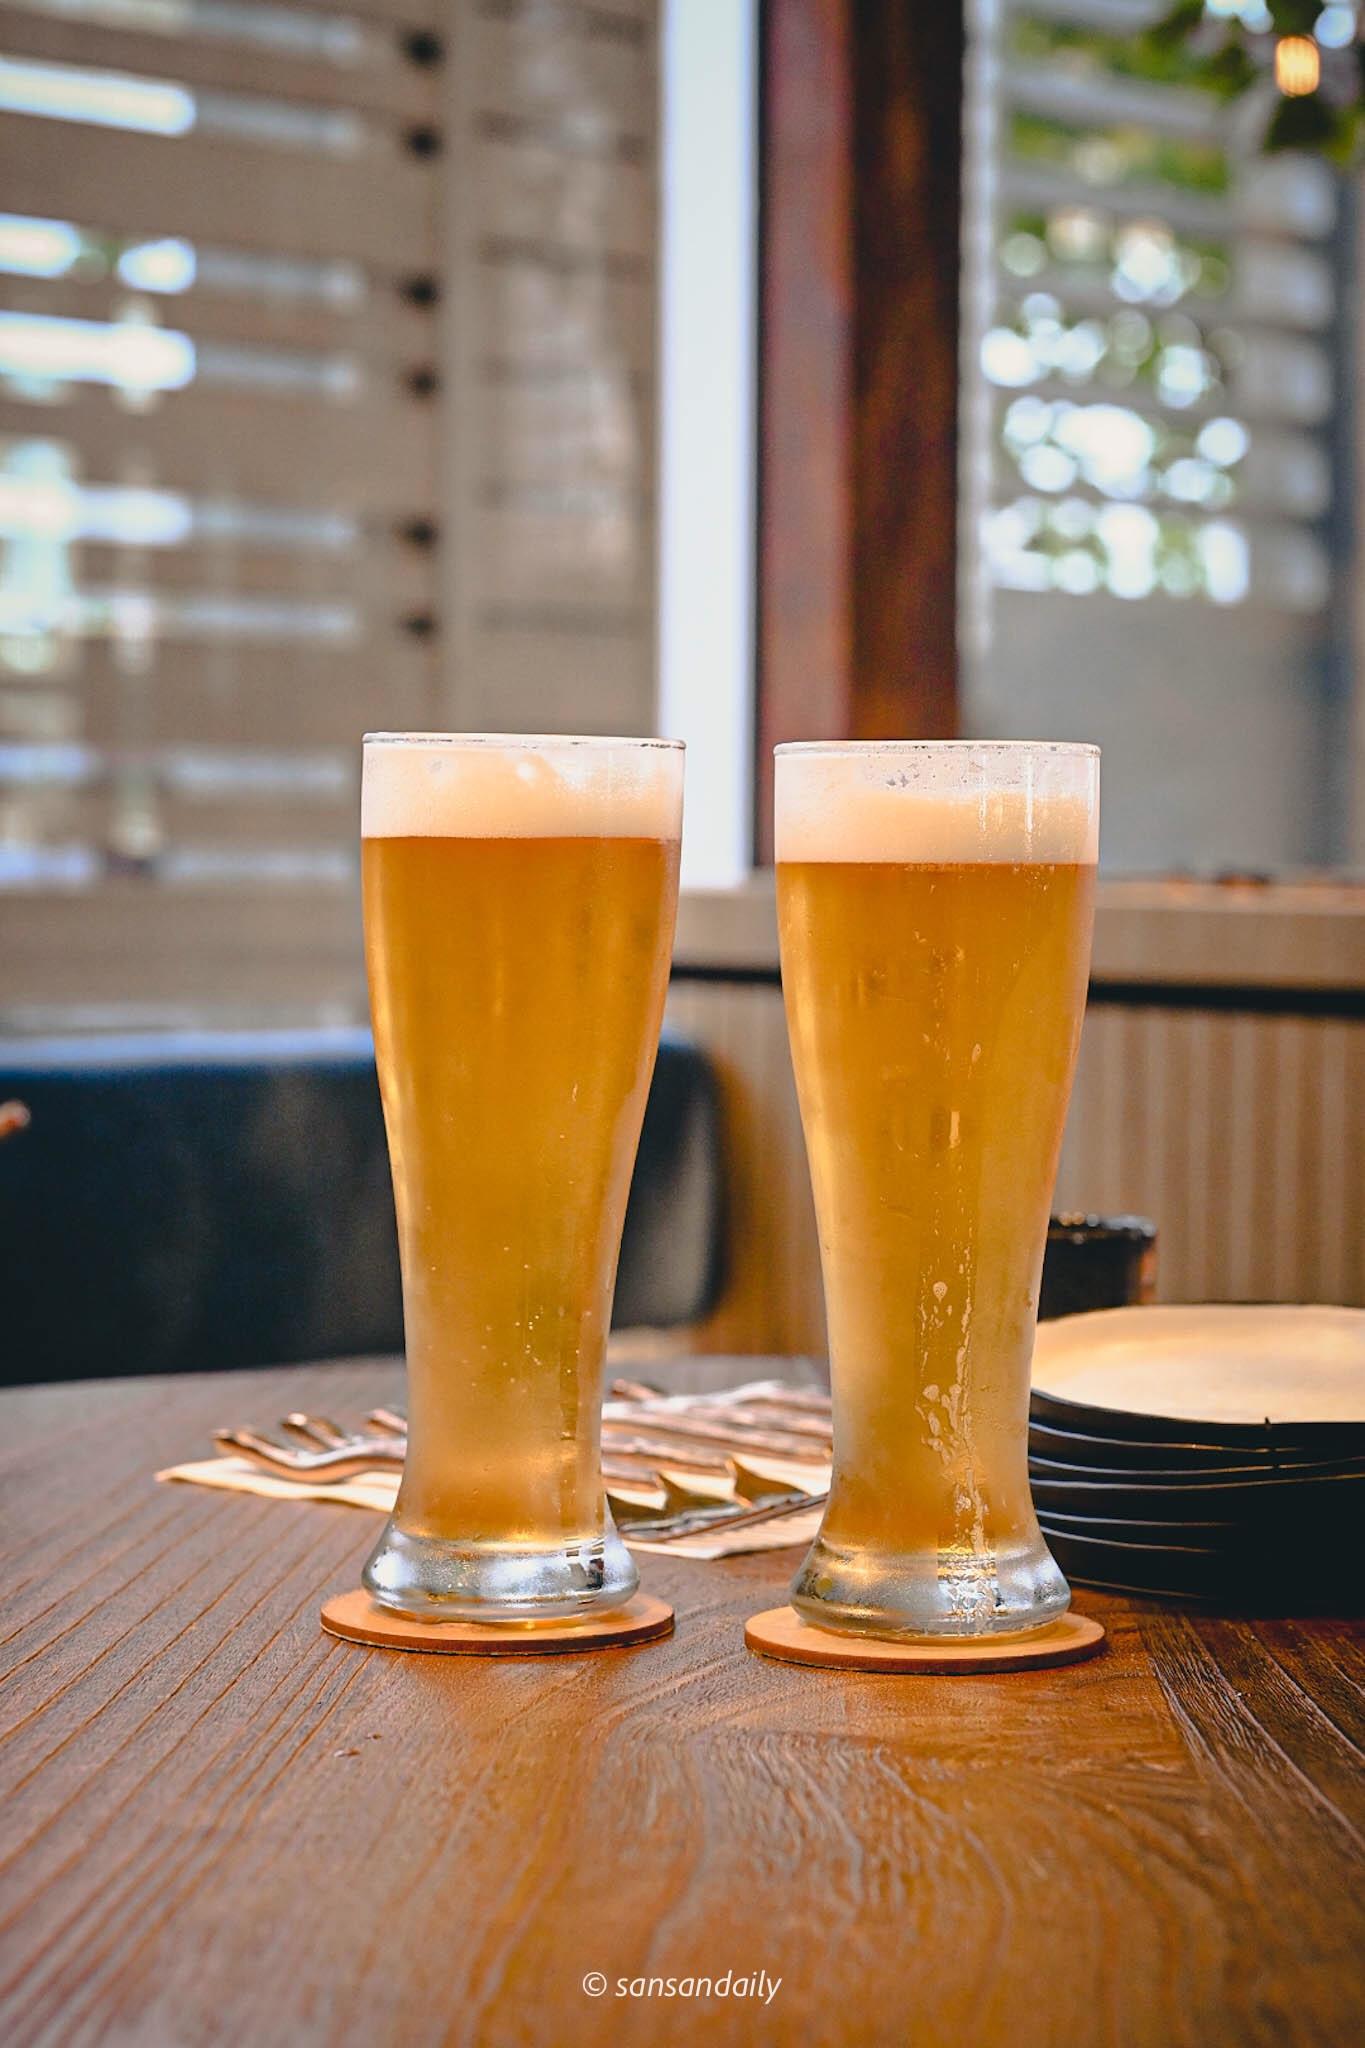 兩杯高杯GUMGUM Beer & Wings精釀啤酒